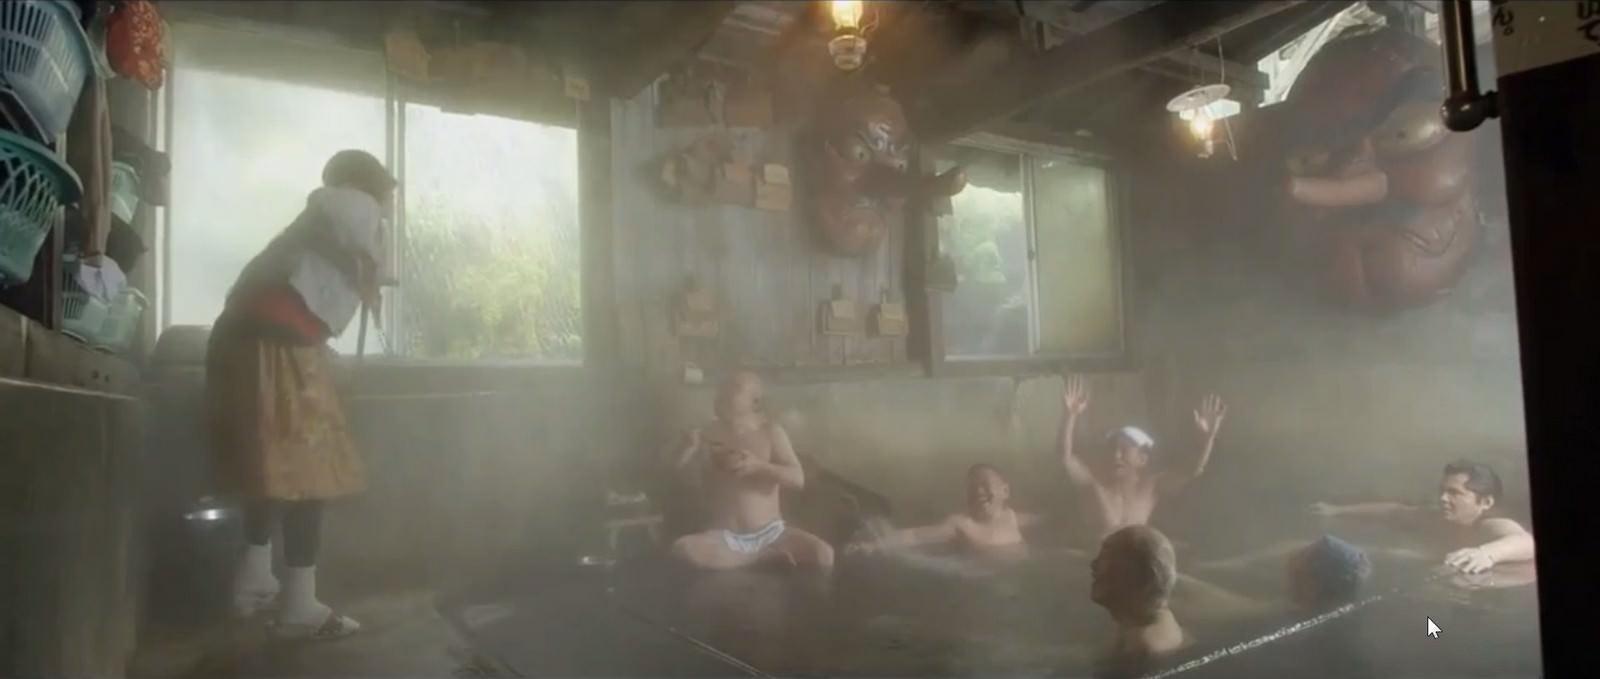 Movie, テルマエ・ロマエ(日本, 2012) / 羅馬浴場(台.港) / Thermae Romae(英文), 電影劇照, 場景